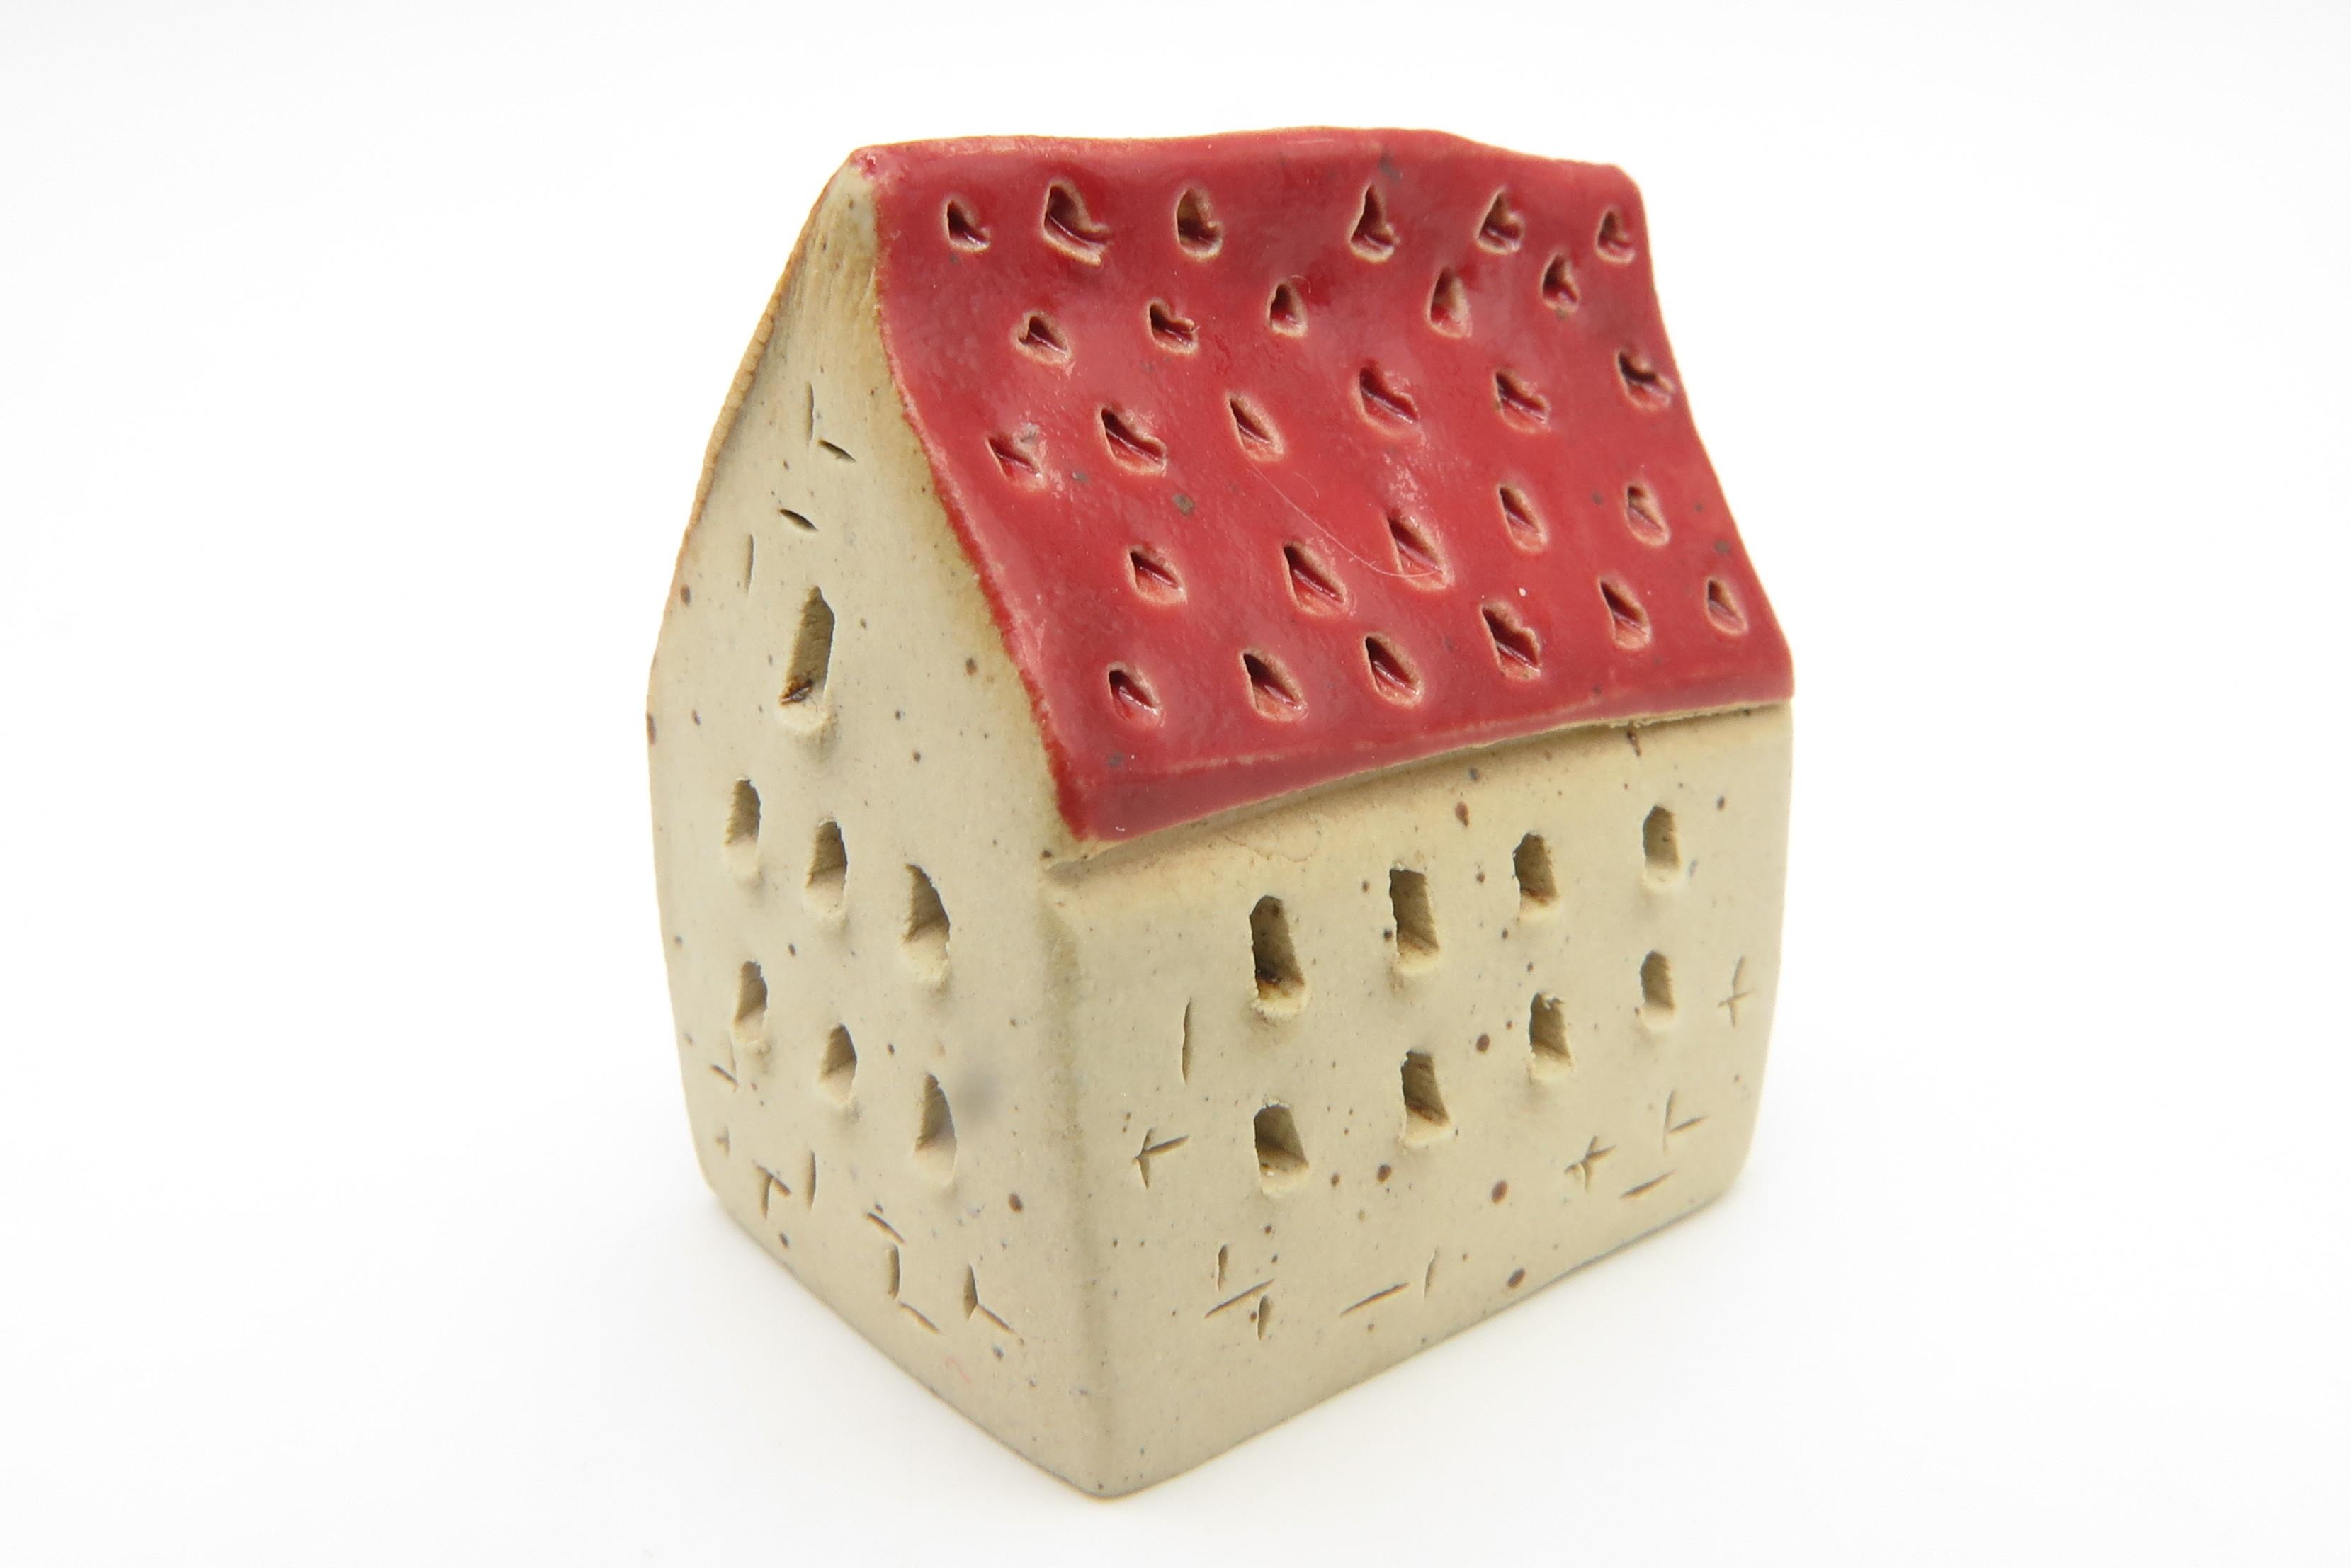 Schiefes Erdbeerhäuschen Rot Keramik/ S 3cm